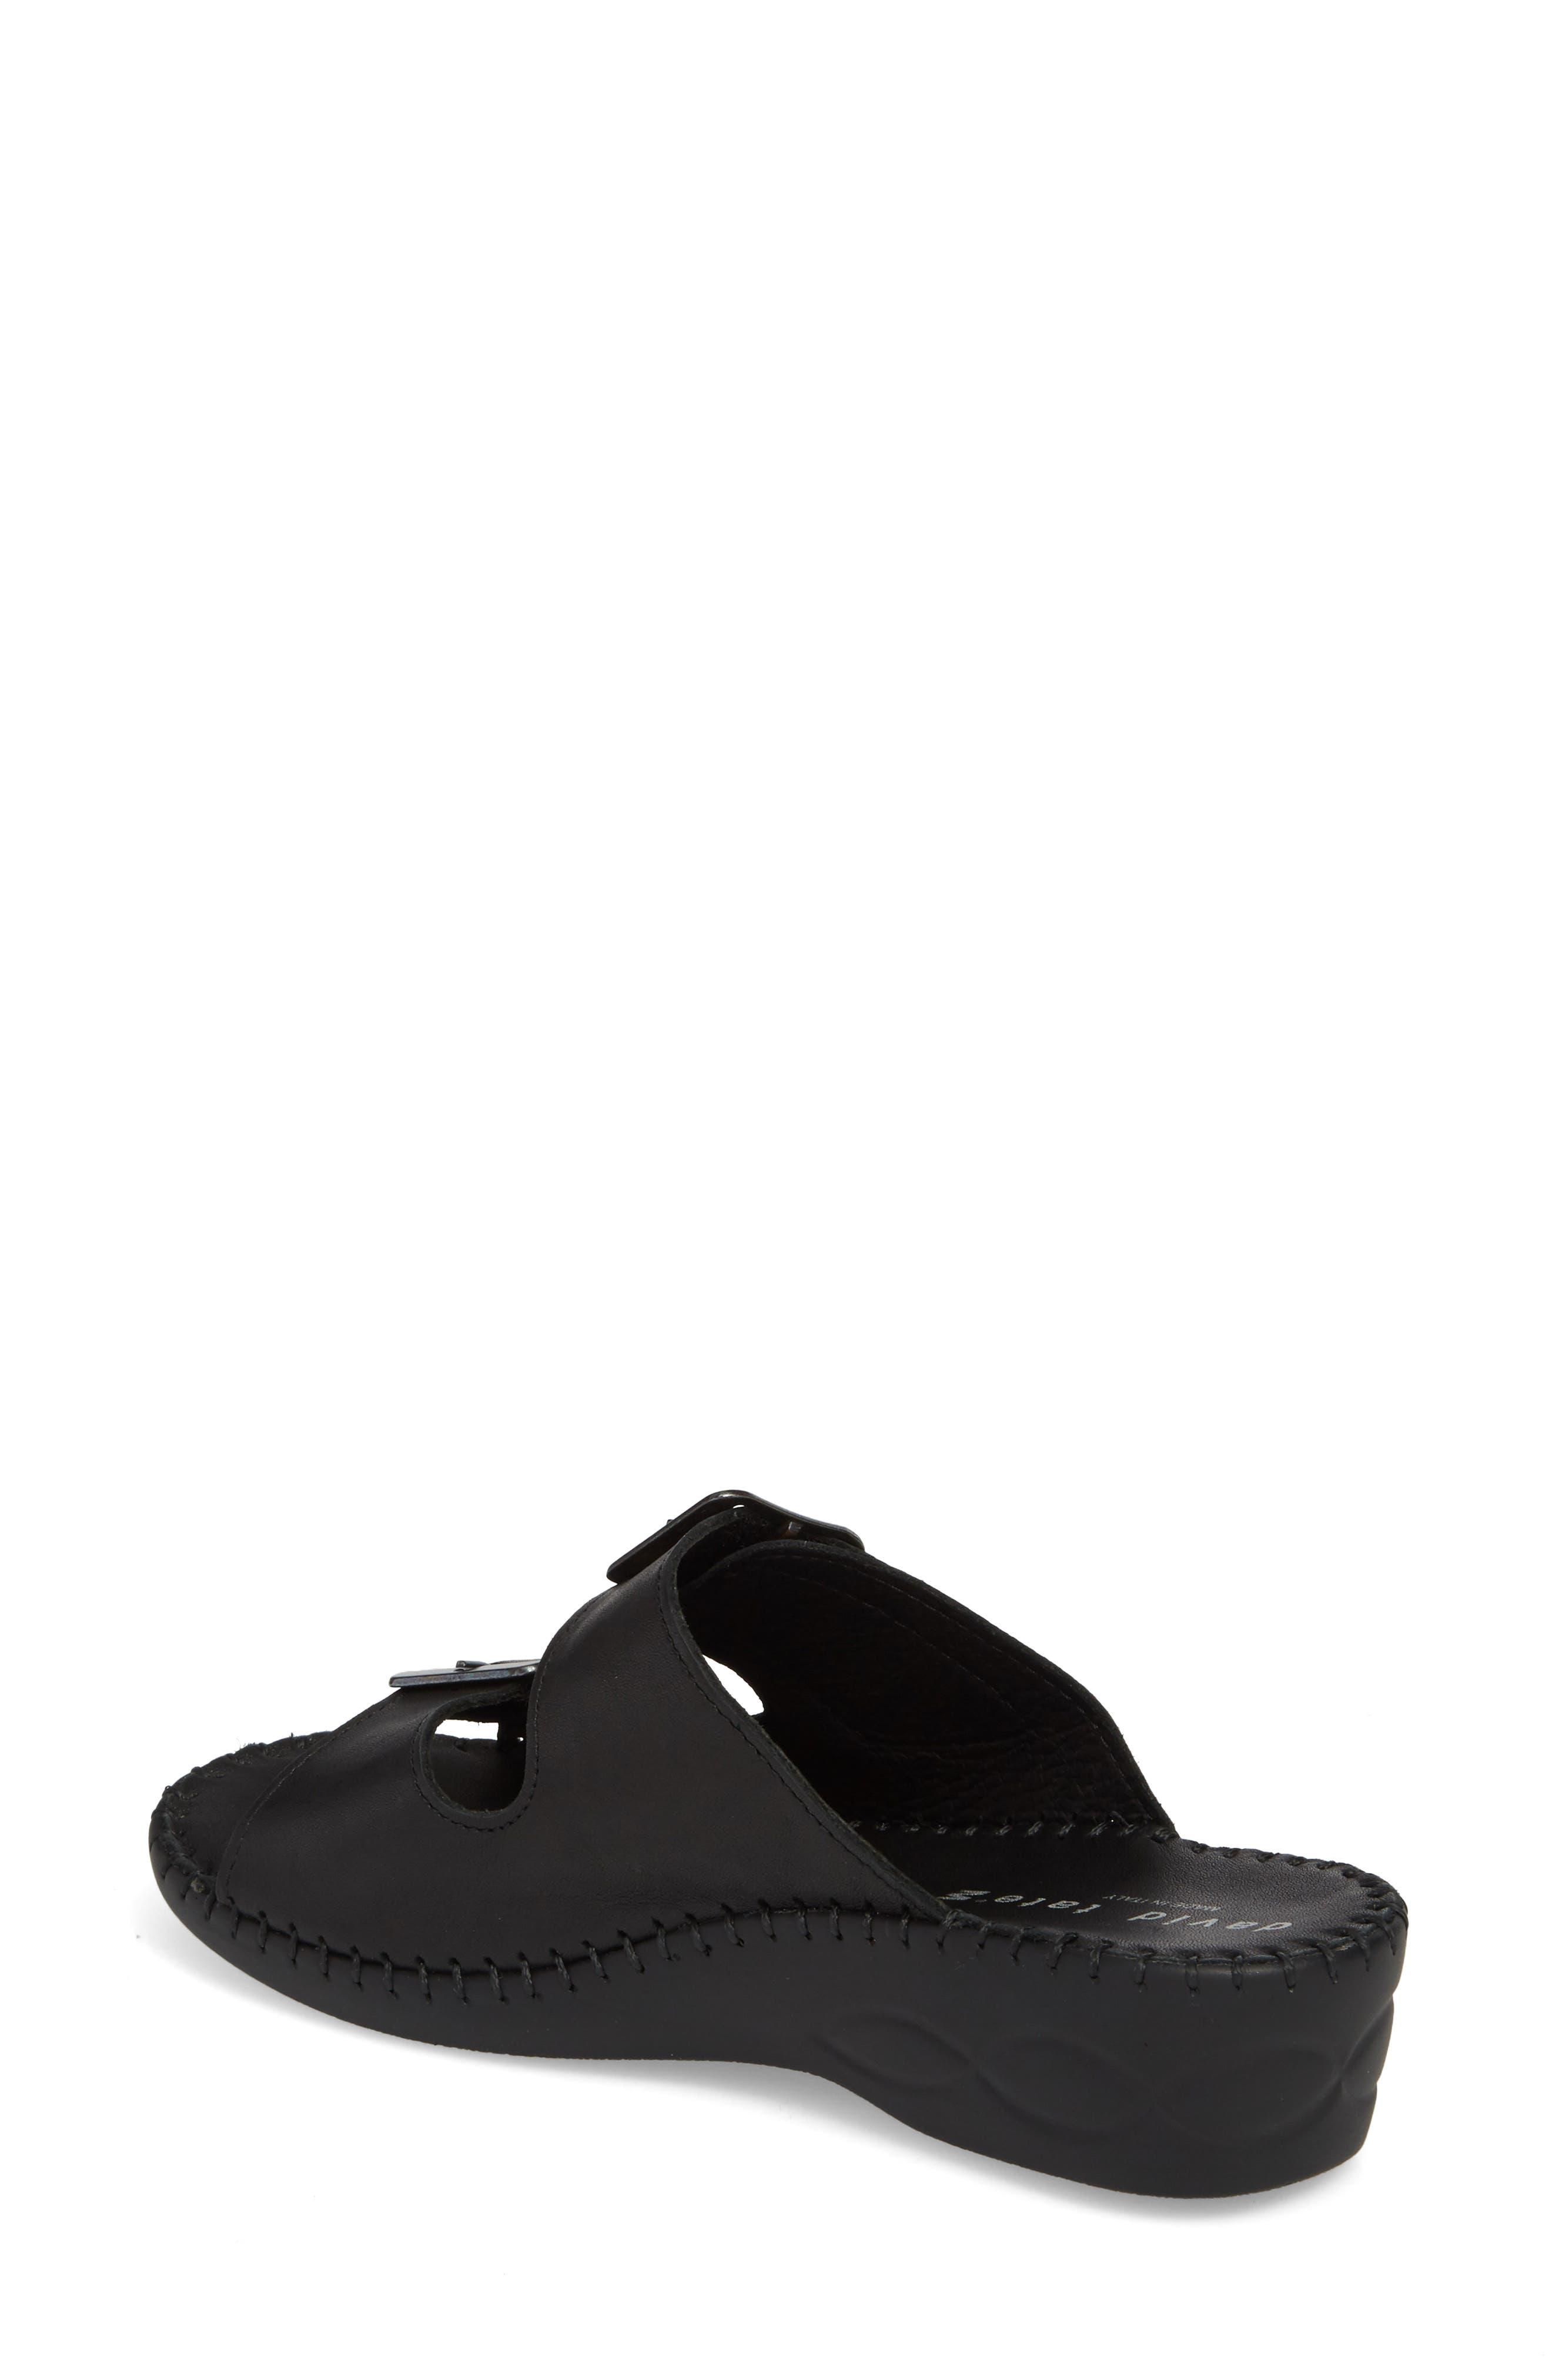 Sol Sandal,                             Alternate thumbnail 2, color,                             Black Leather